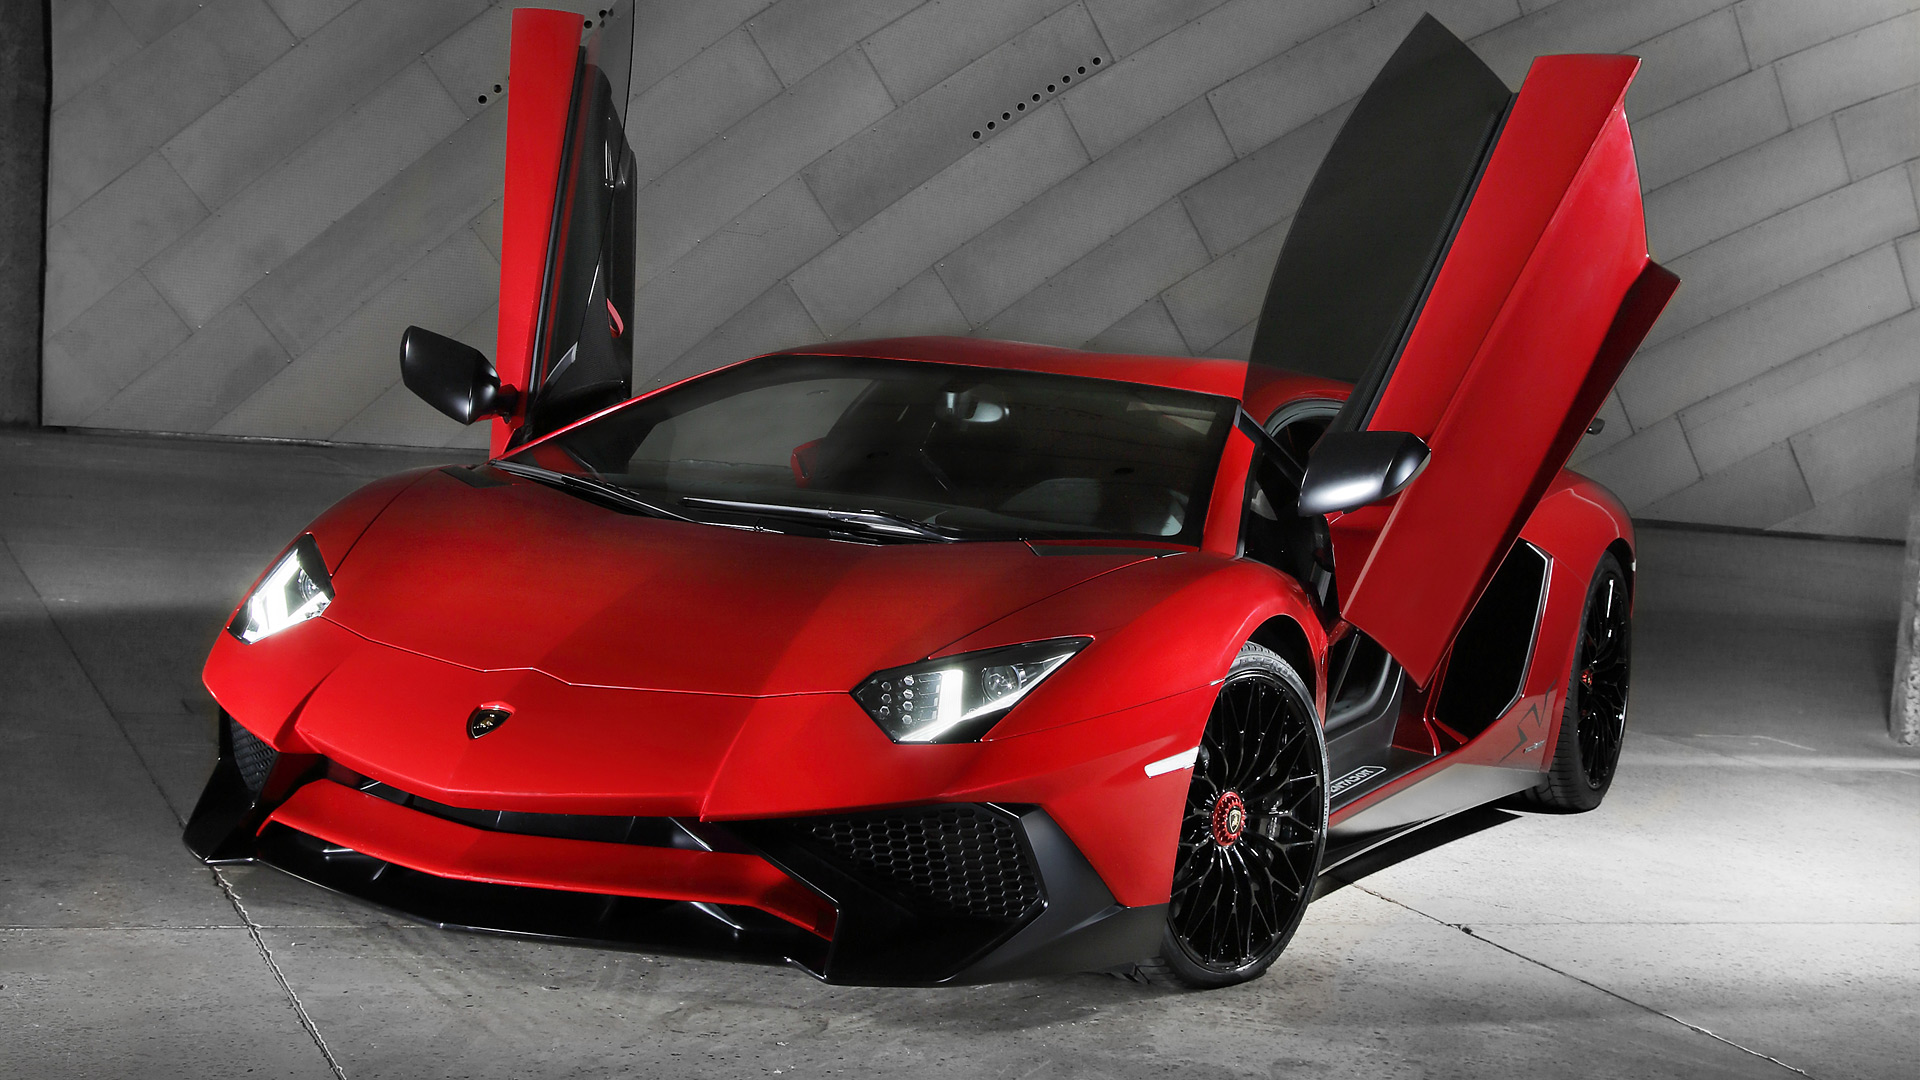 Lamborghini-Aventador-LP750-4-SV – 01